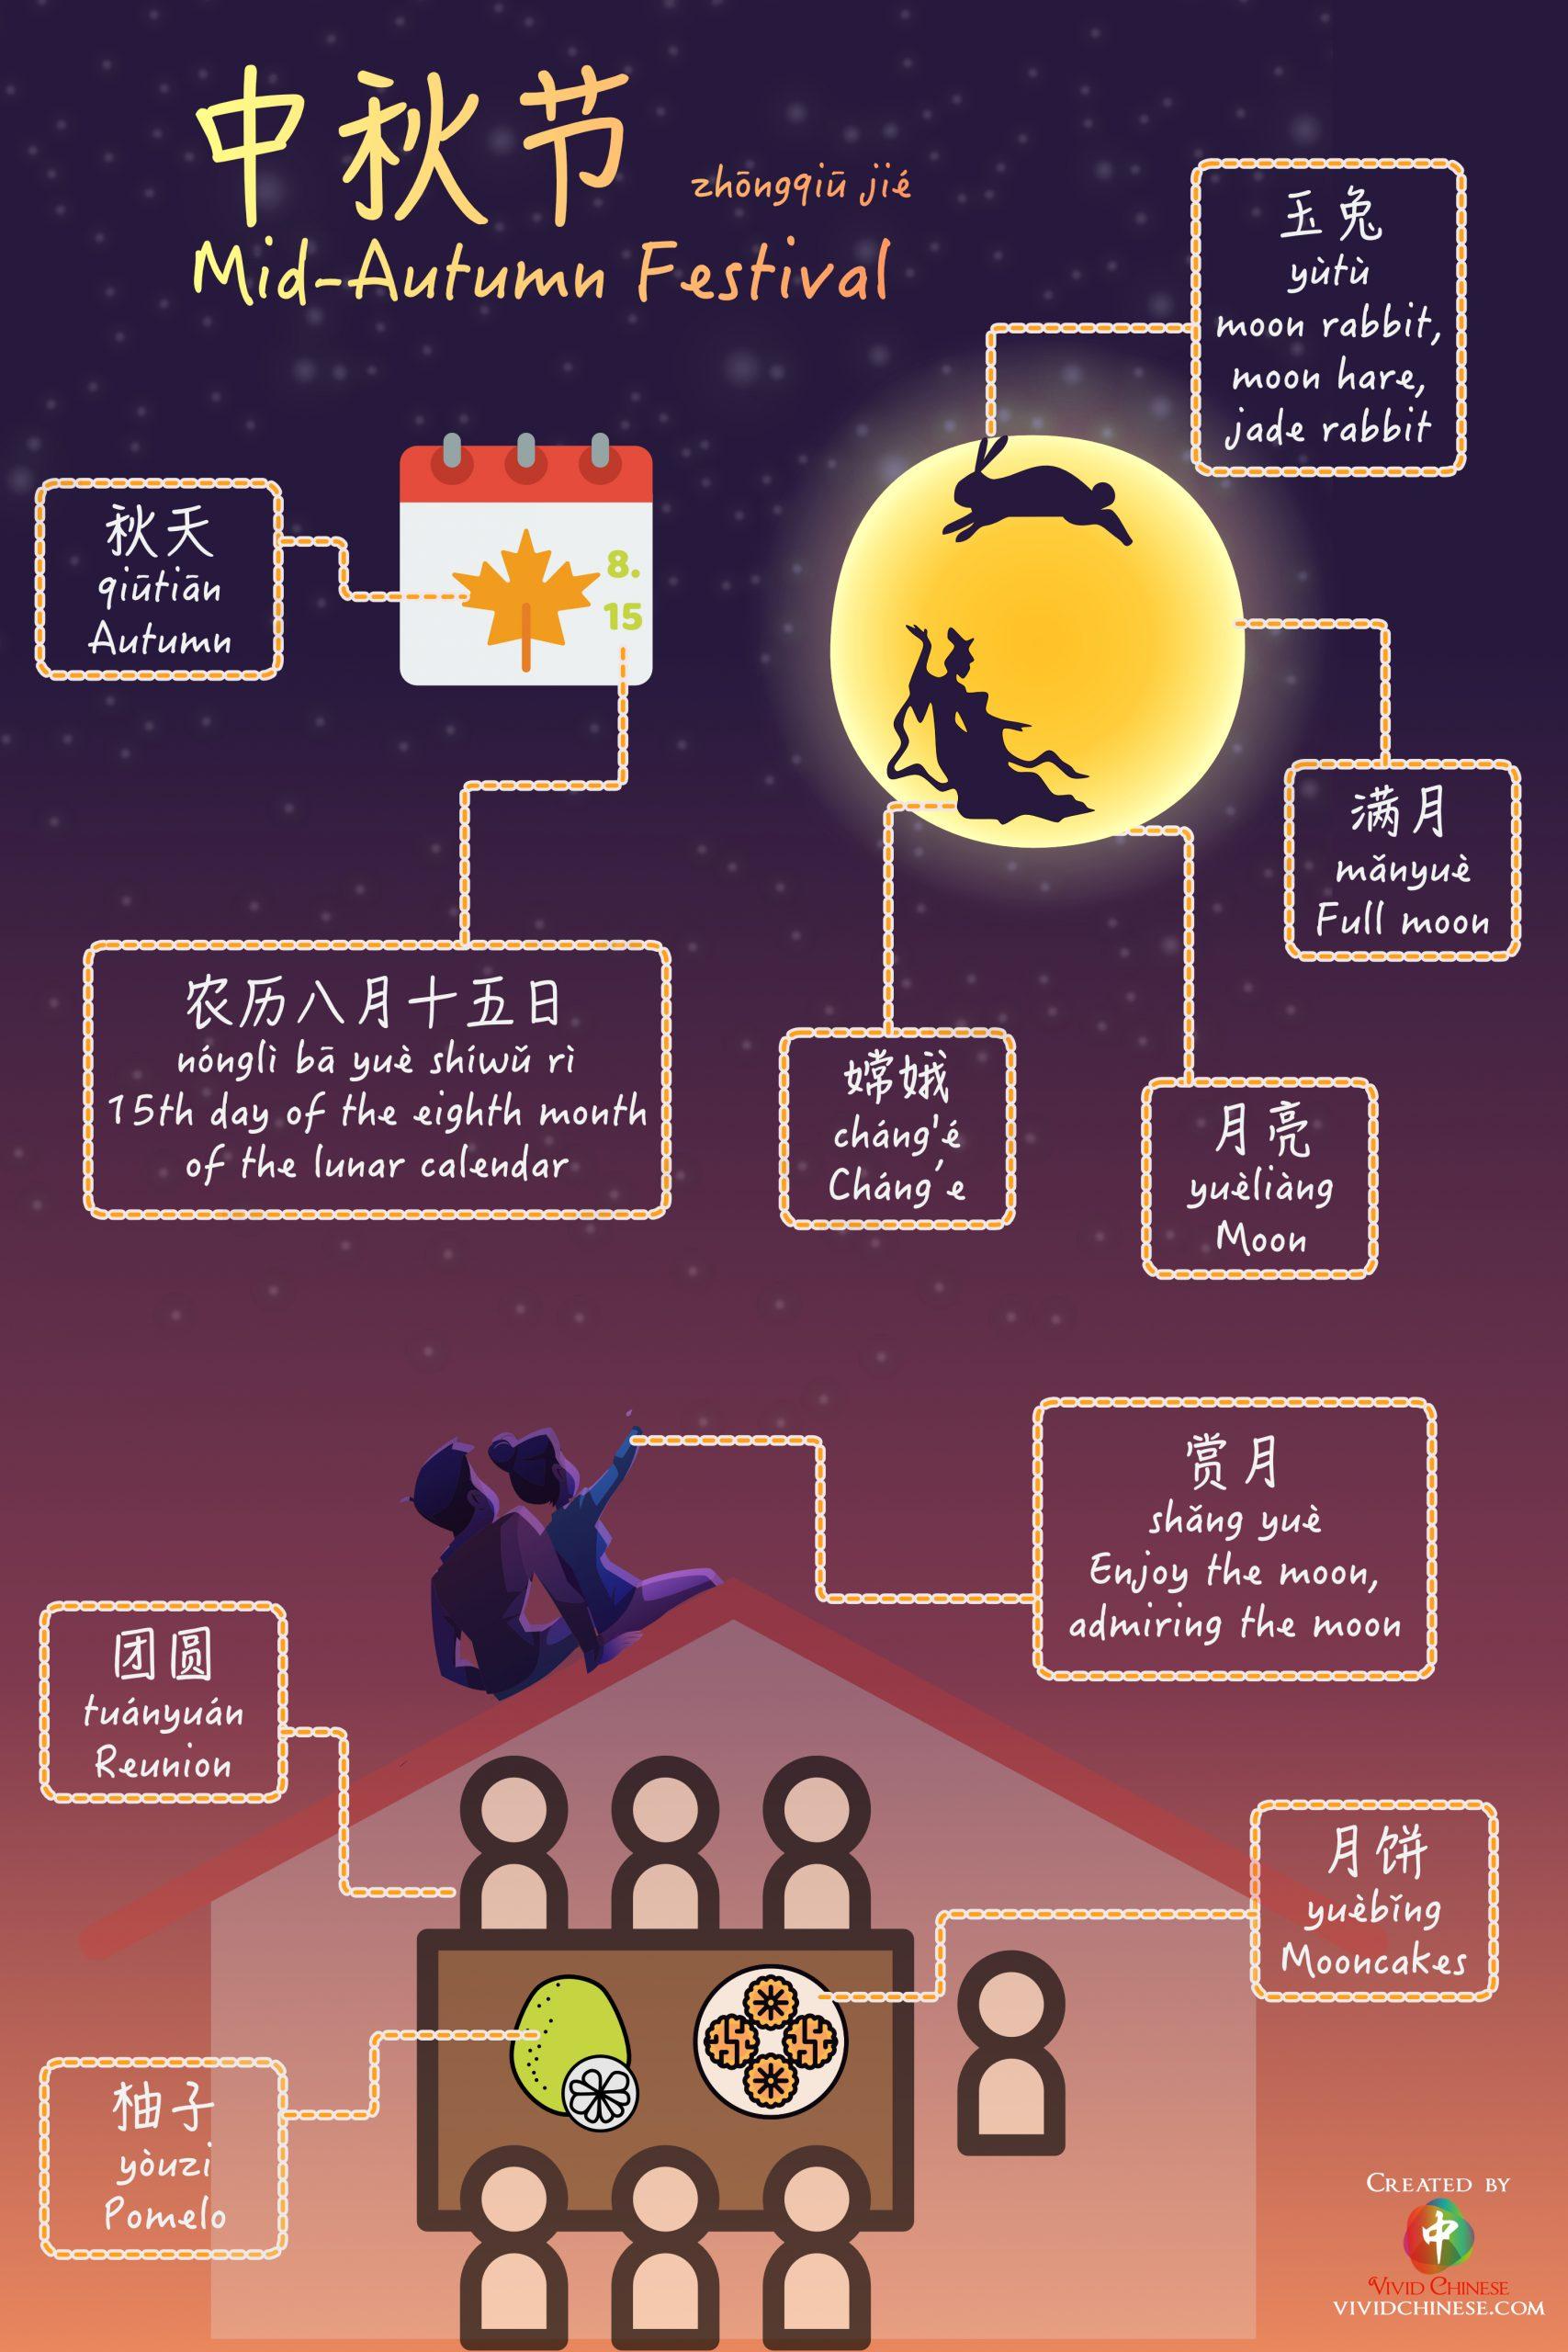 10 most common Mid-Autumn Festival vocabulary